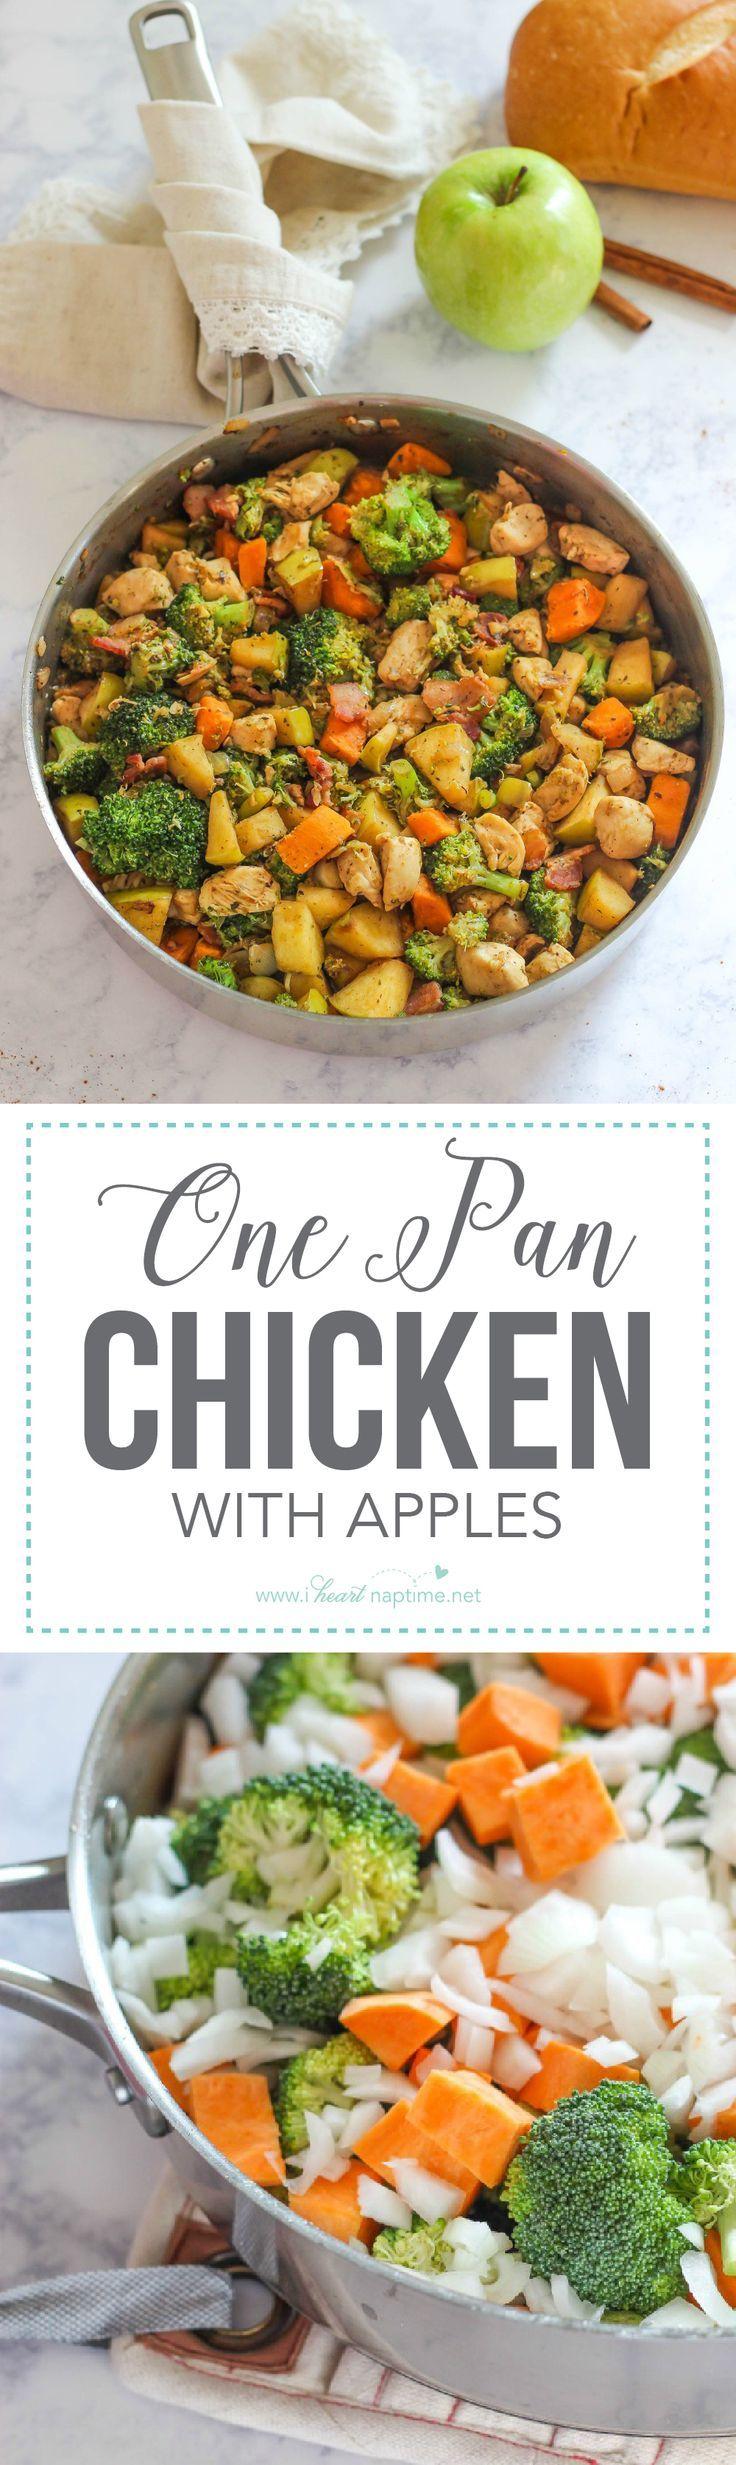 healthy vegetables dinner options dinner ideas chicken meals chicken ...